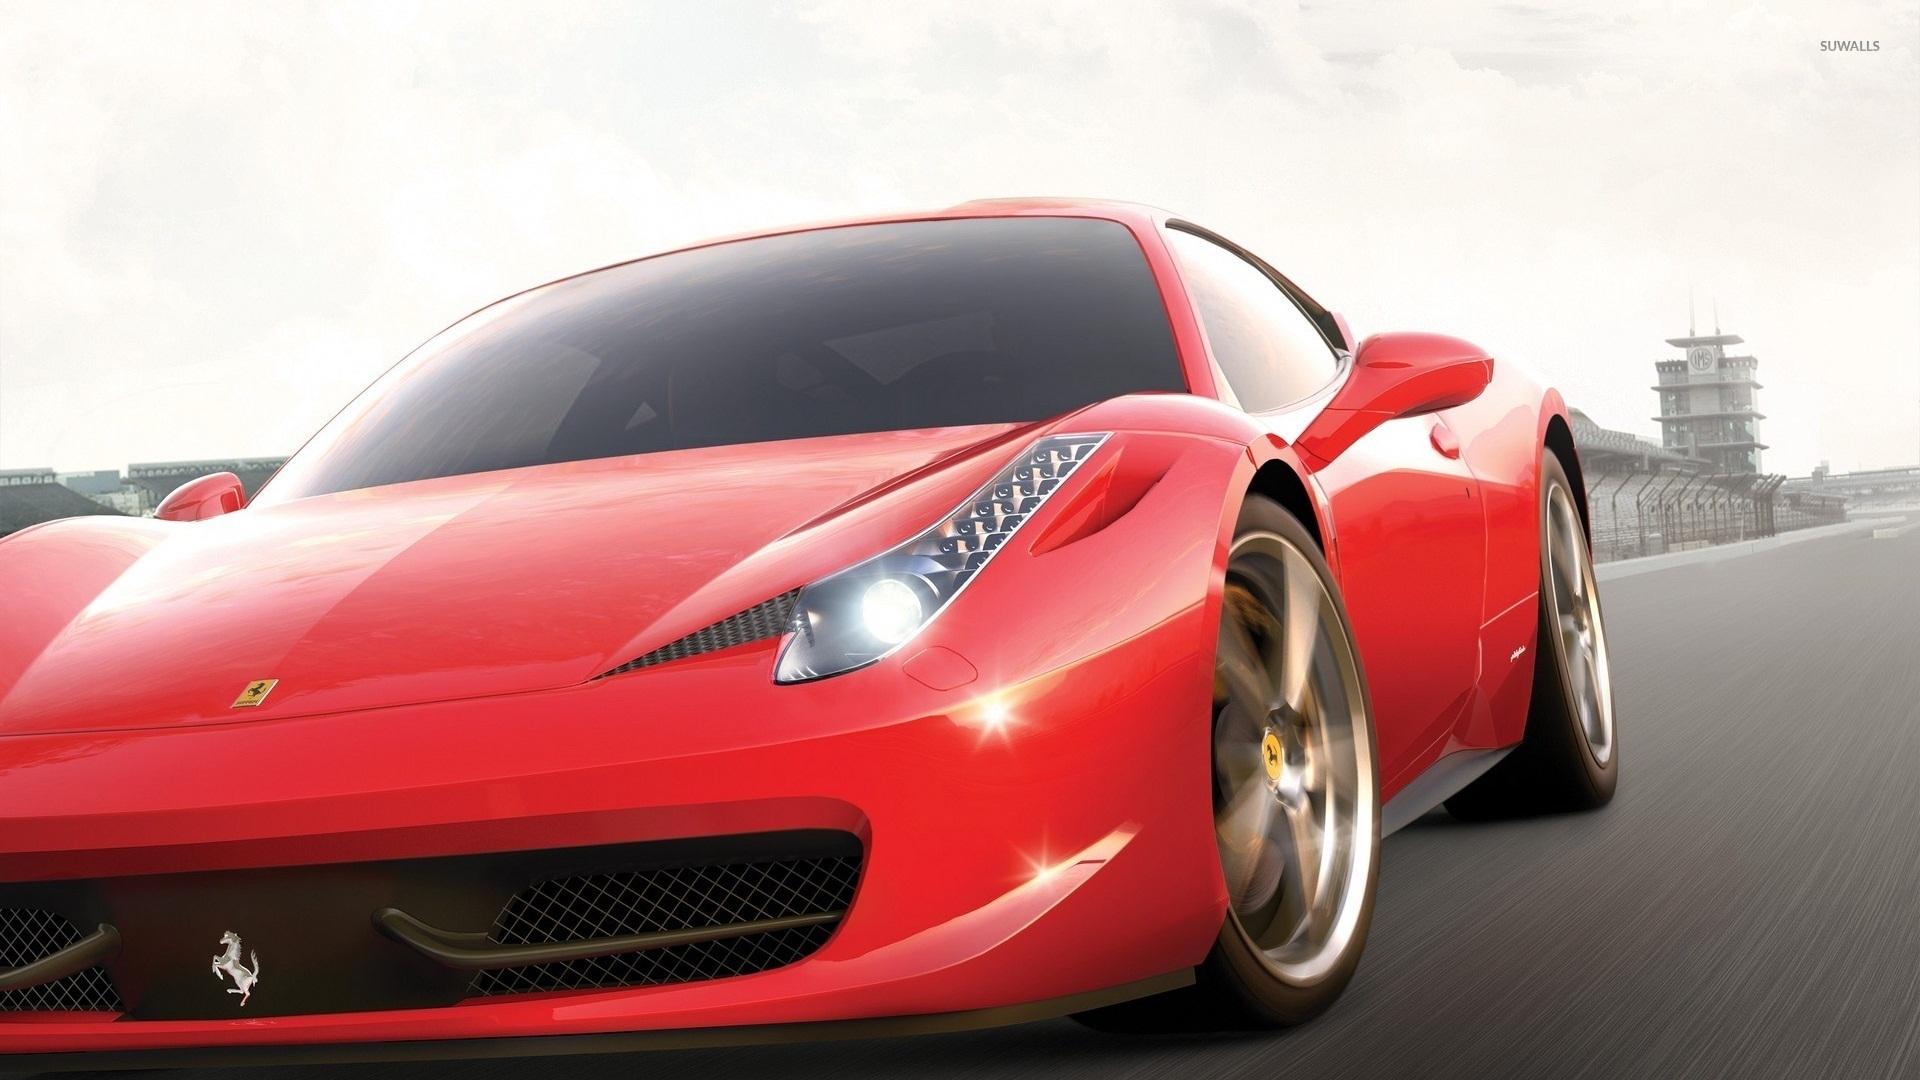 Ferrari 458 Italia Forza Motorsport 4 Wallpaper Game